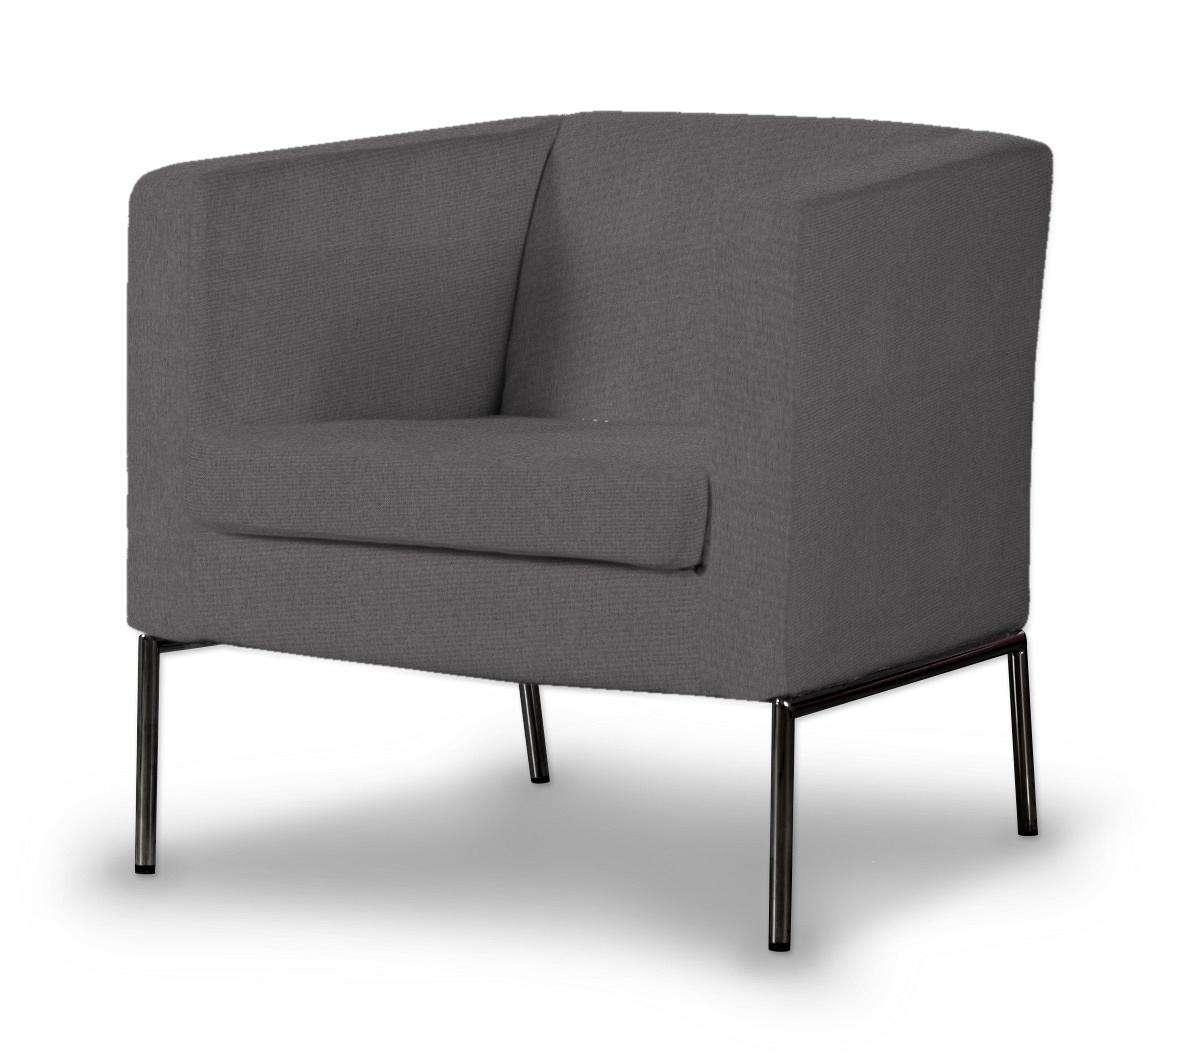 Klappsta Sesselbezug Sessel Klappsta von der Kollektion Etna, Stoff: 705-35